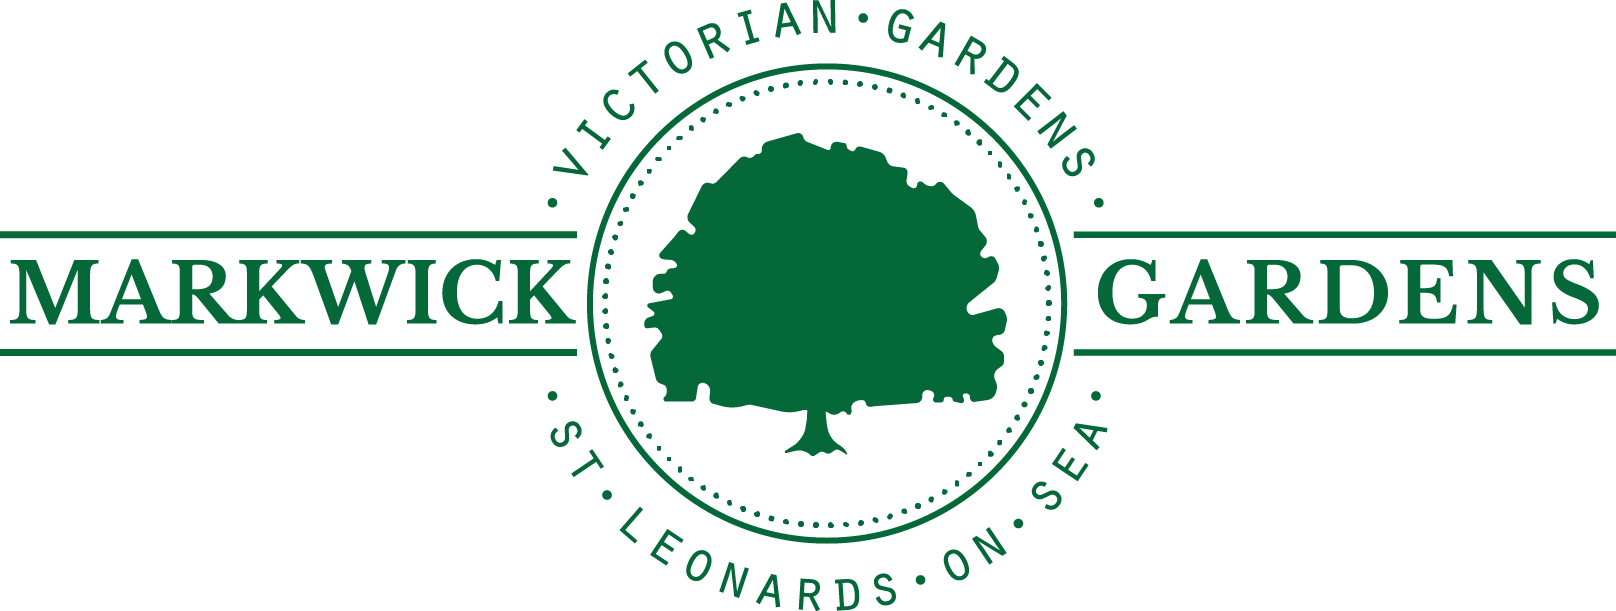 Markwick Gardens Logo